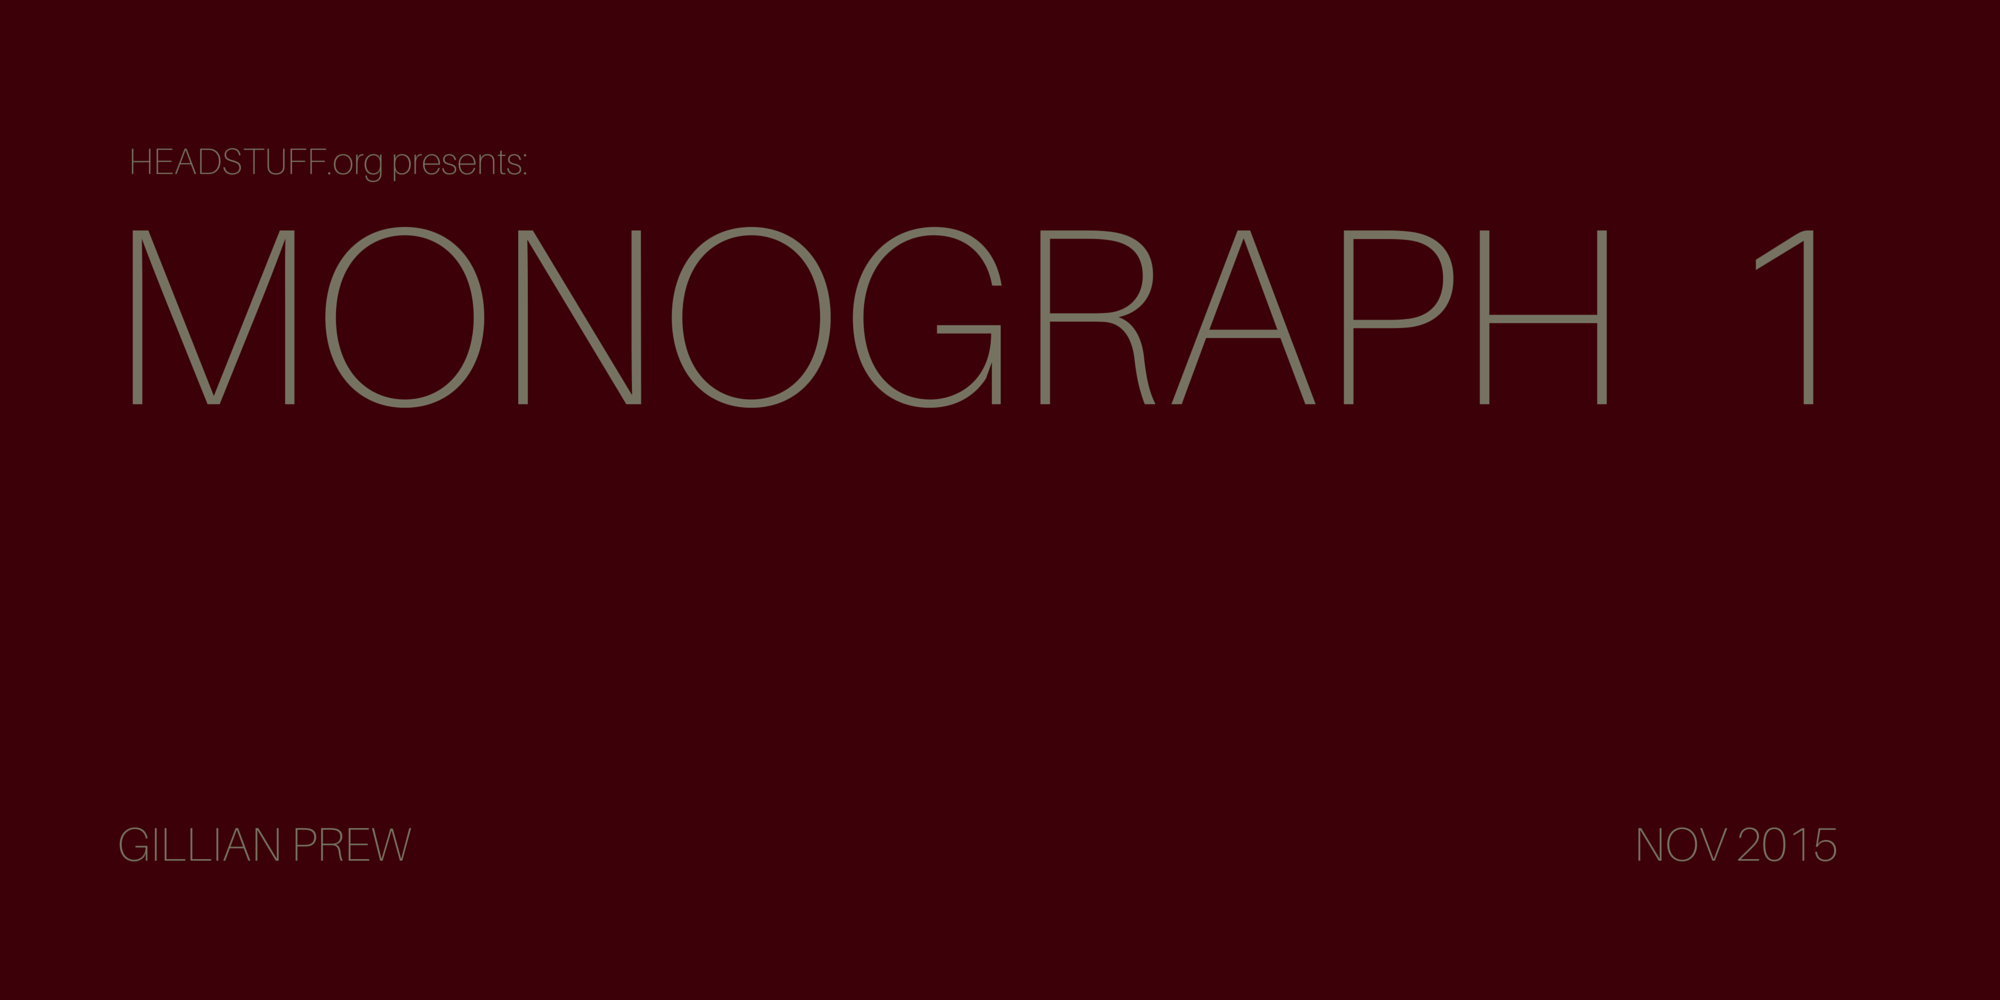 Poetry Monograph I: Gillian Prew - Headstuff.org